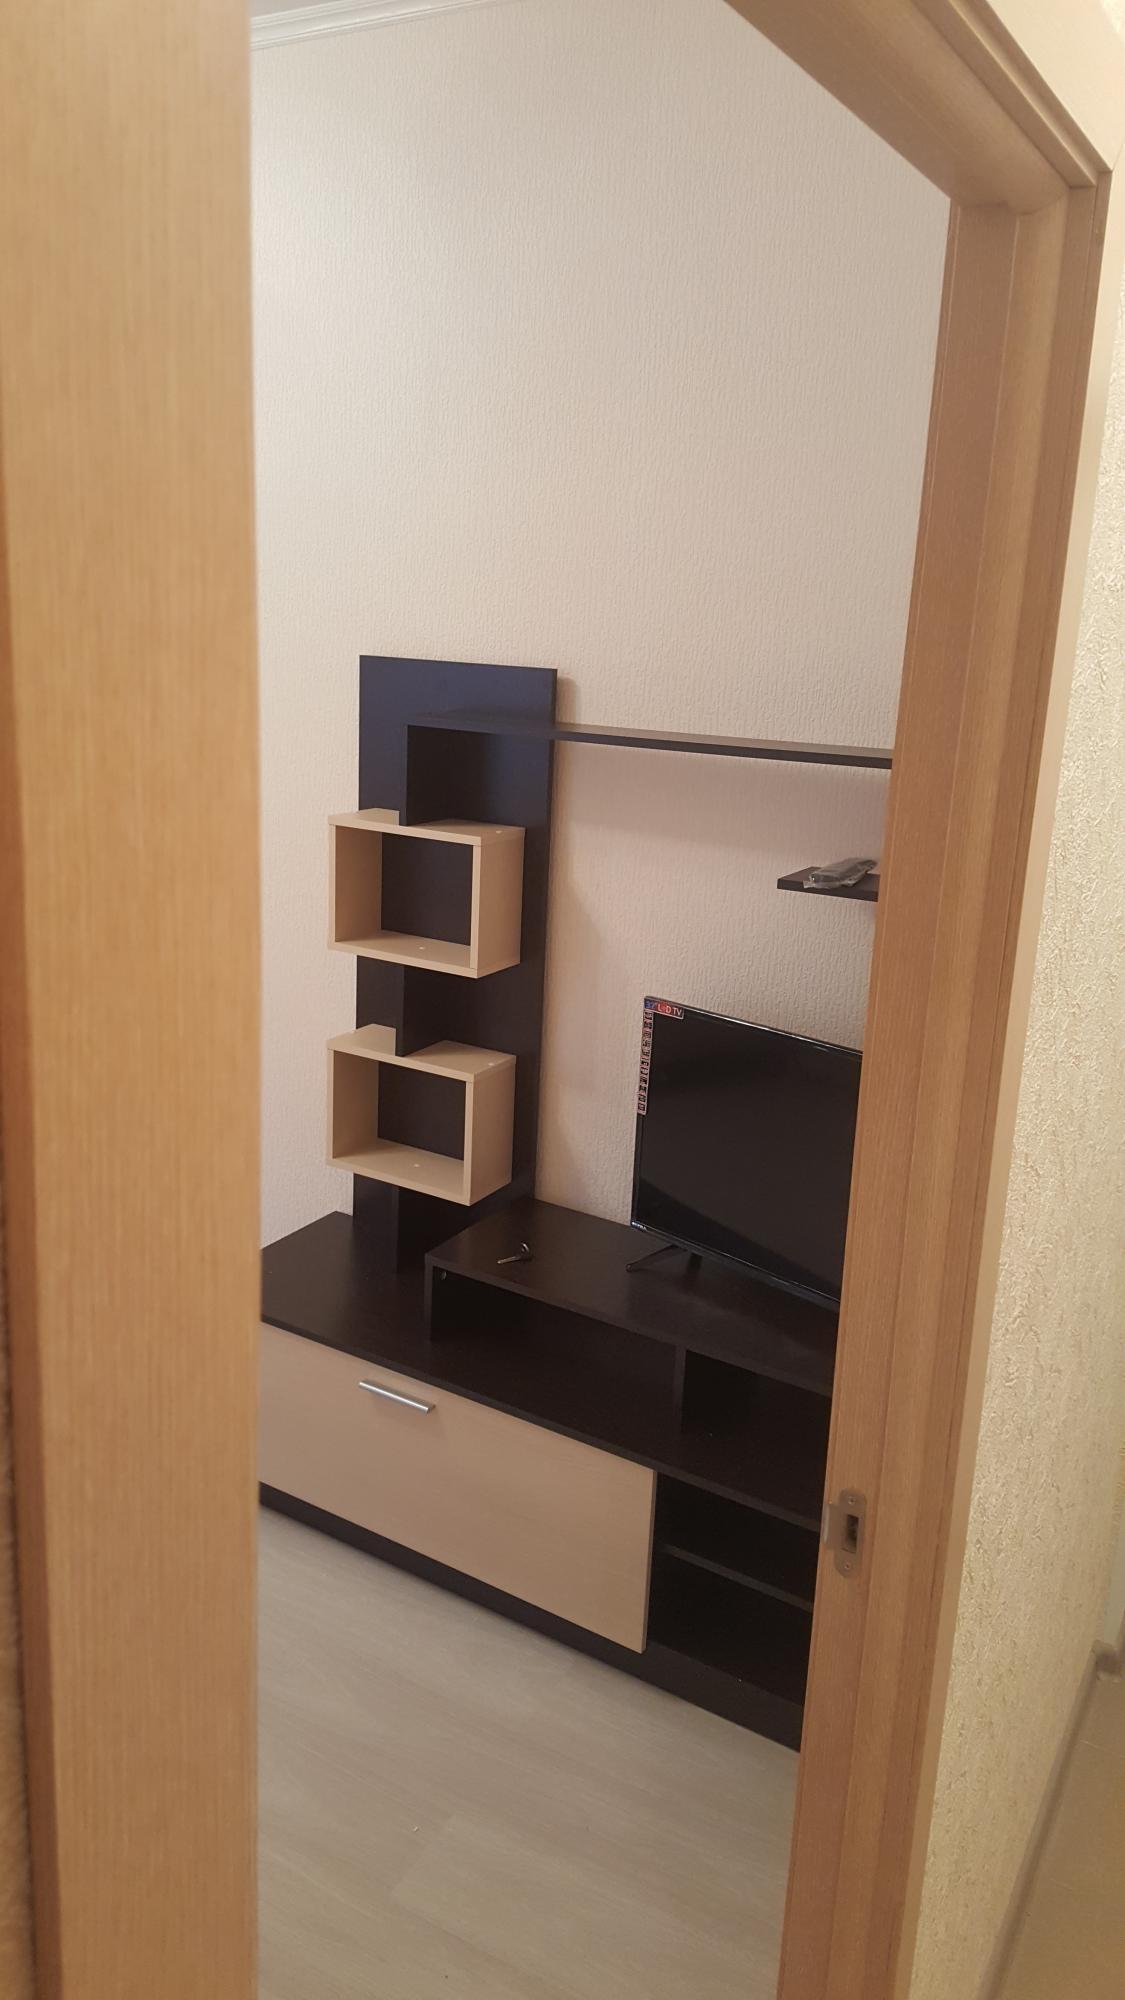 Квартира, 1 комната, 40 м² в Зеленограде 89776541696 купить 2